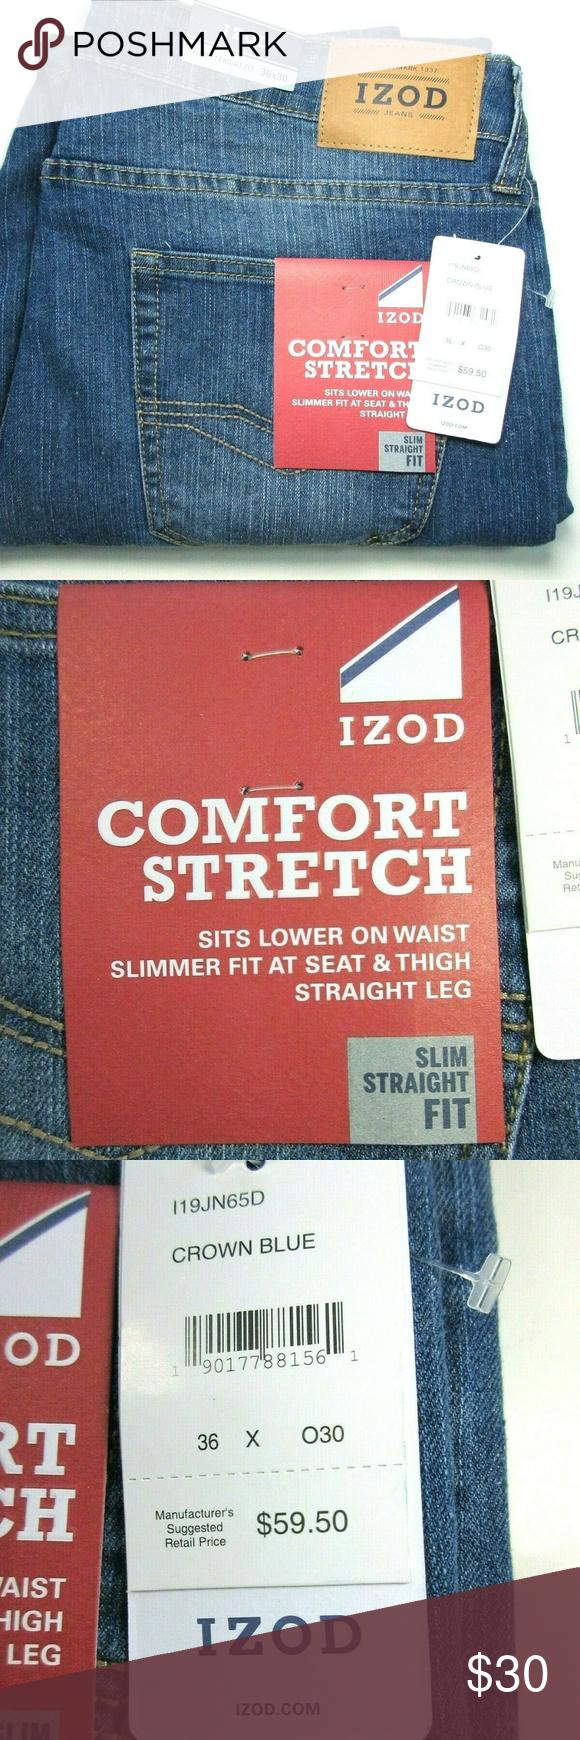 1c1b56c46679a IZOD Men Comfort Stretch Slim Straight Jeans 36x30 IZOD Men's ...